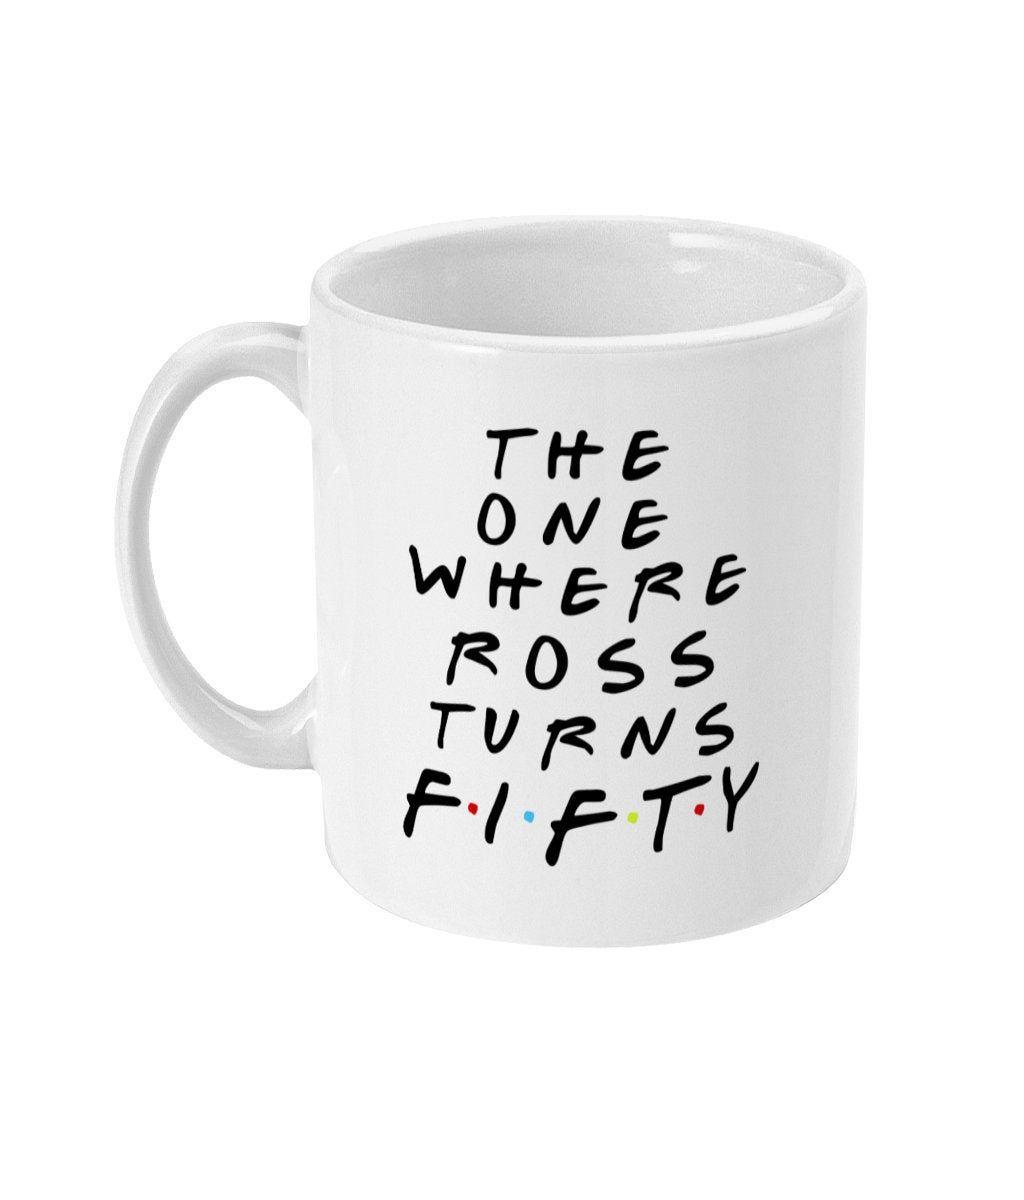 50th birthday gift for man personalised 50th birthday mug